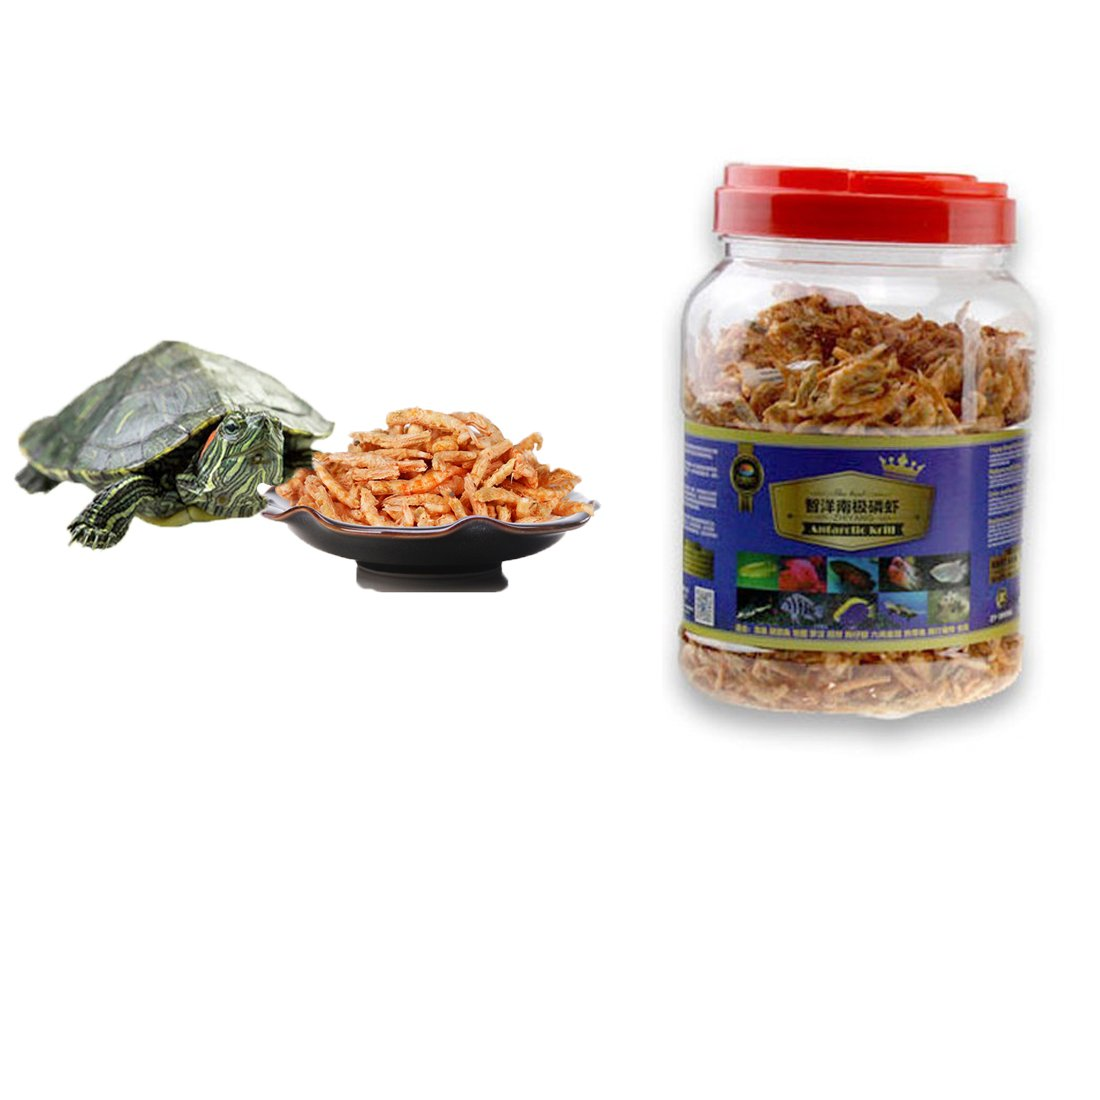 3000ml Aquatic Turtle Food,101.44 oz, Floating Shrimp Krill Freeze Dried for Reptile Aquarium Pond Fish Koi Cichlid Feed